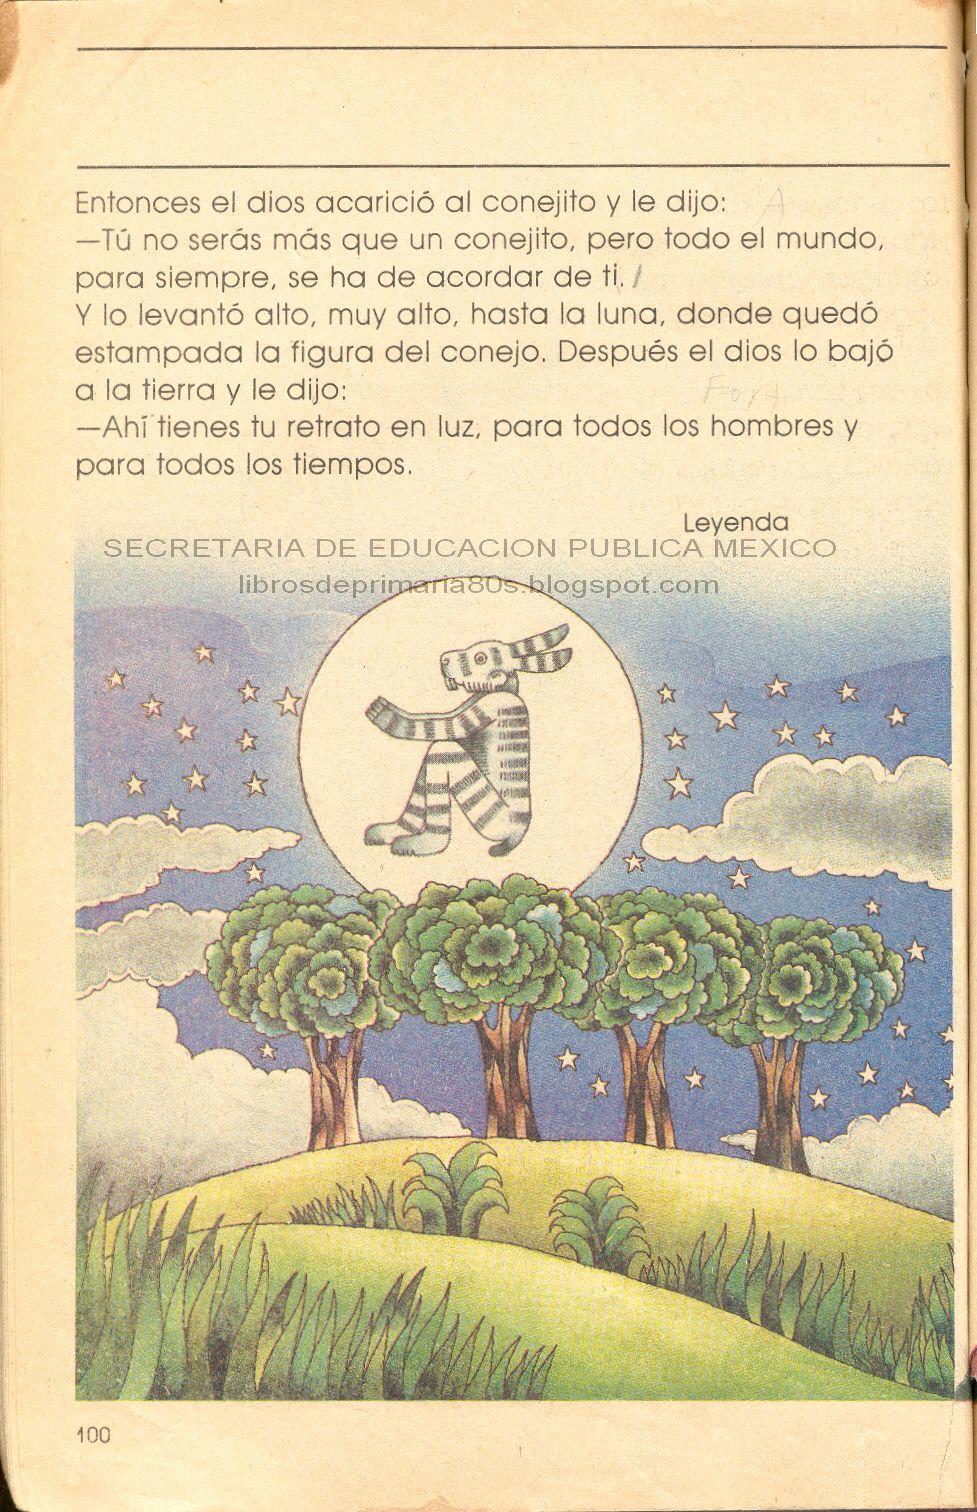 http://2.bp.blogspot.com/_x9mWwnjjxZ0/TUmahFXBX4I/AAAAAAAAALM/Wv2RpJEZ7iw/s1600/Mi+libro+de+Segundo+lecturas+hoja+29.jpg